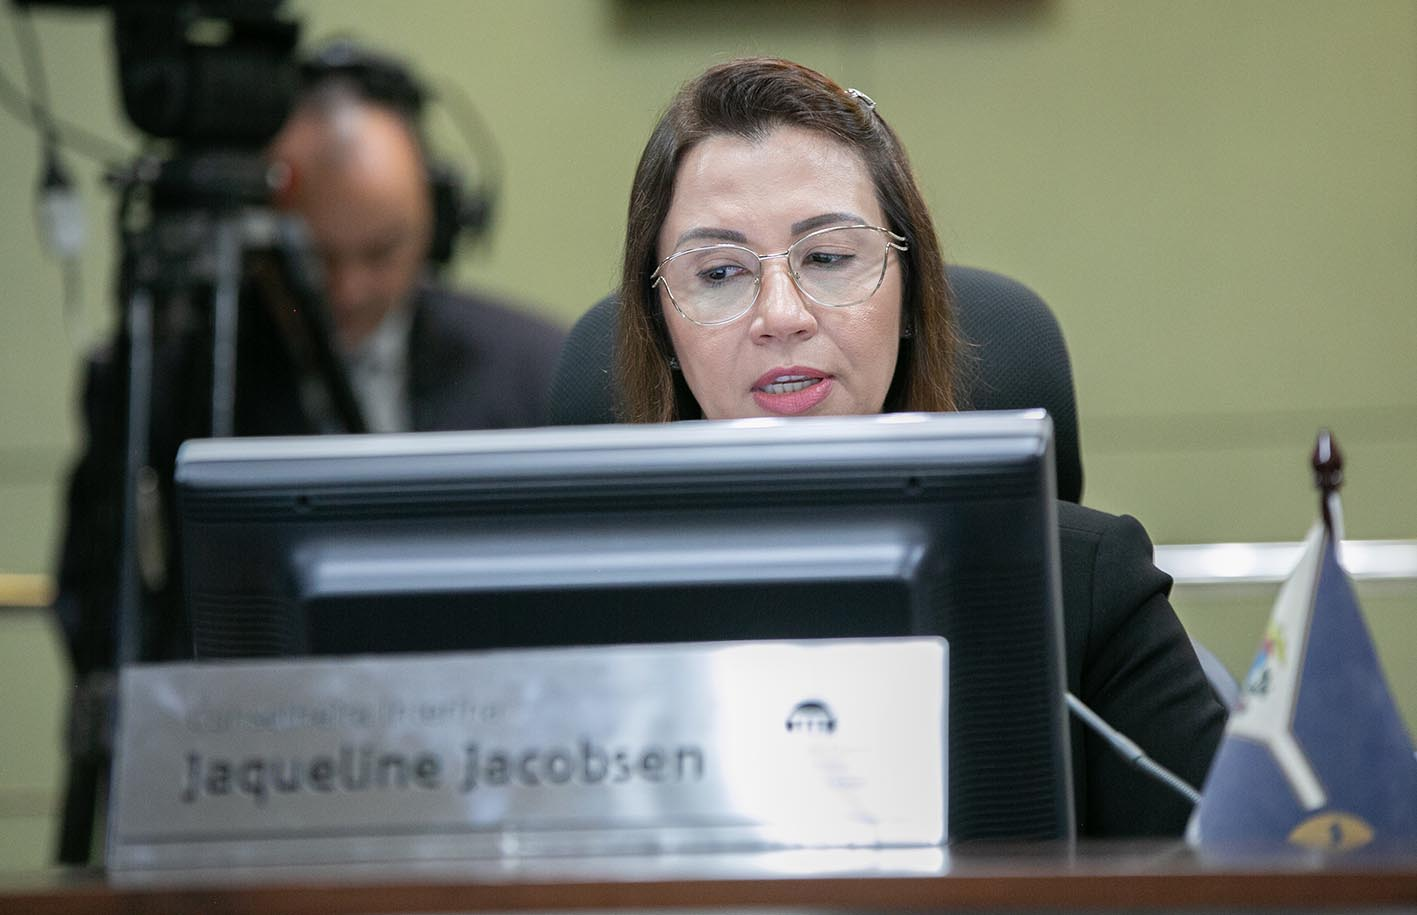 Conselheira interina, Jaqueline Jacobsen